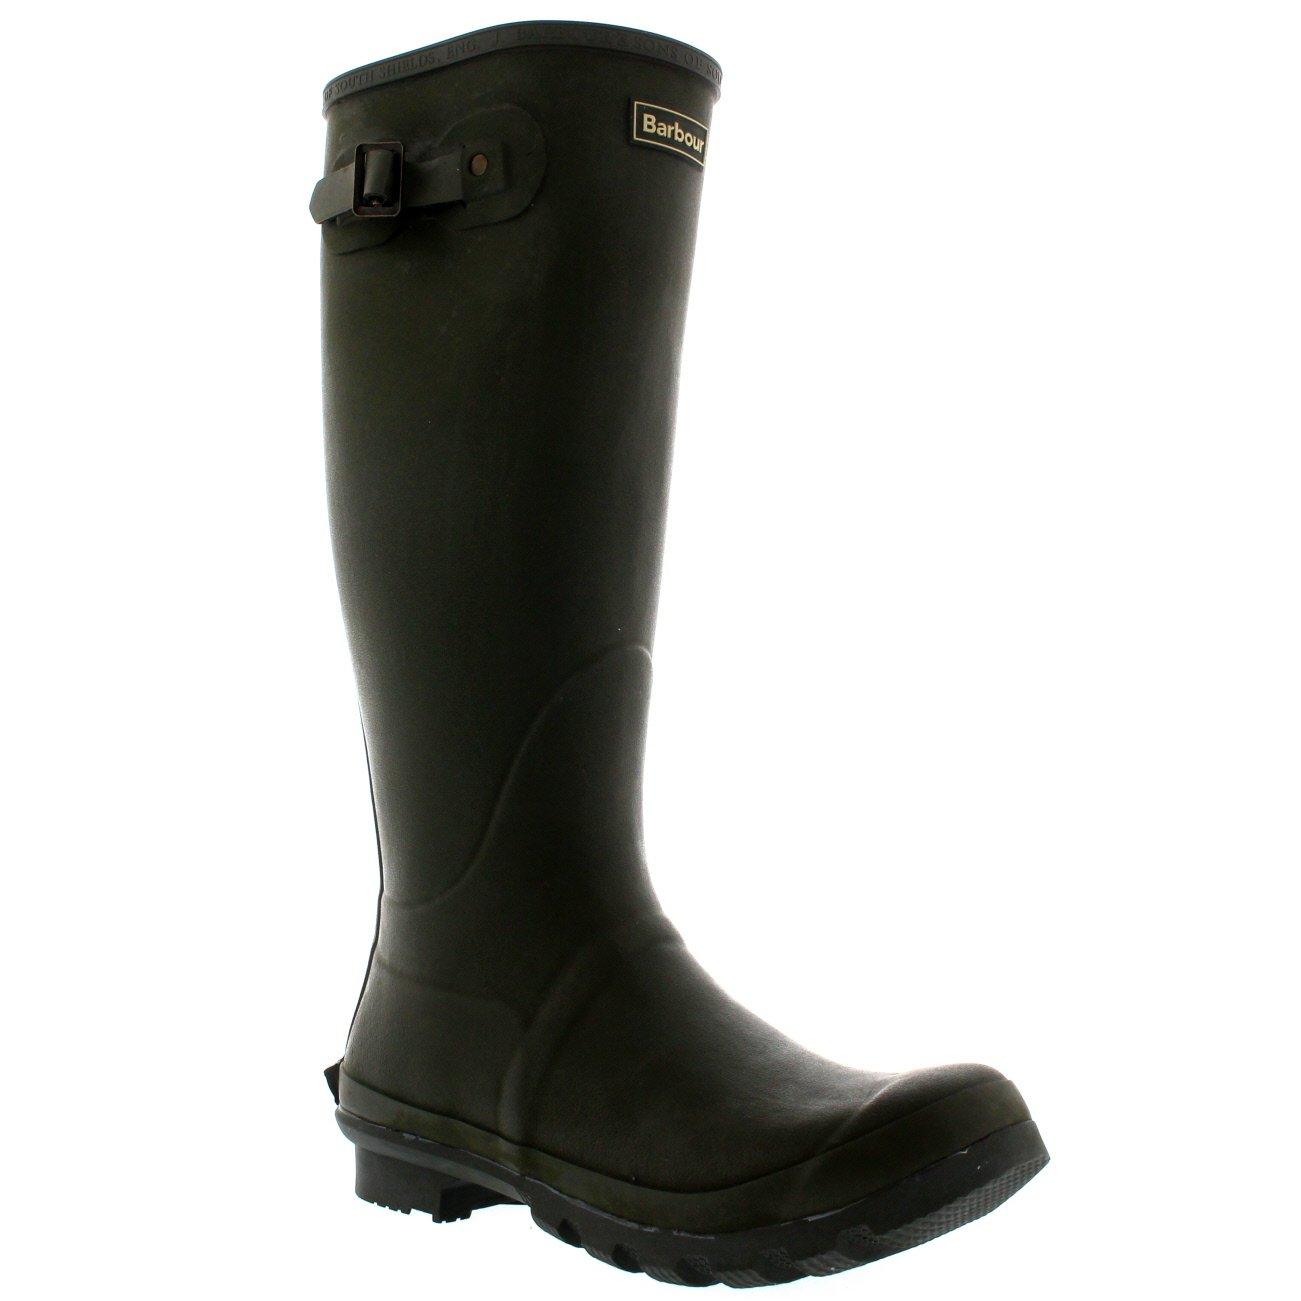 Barbour Mens Bede Winter Mid Calf Snow Waterproof Rain Wellington Boots - Olive - 10-43